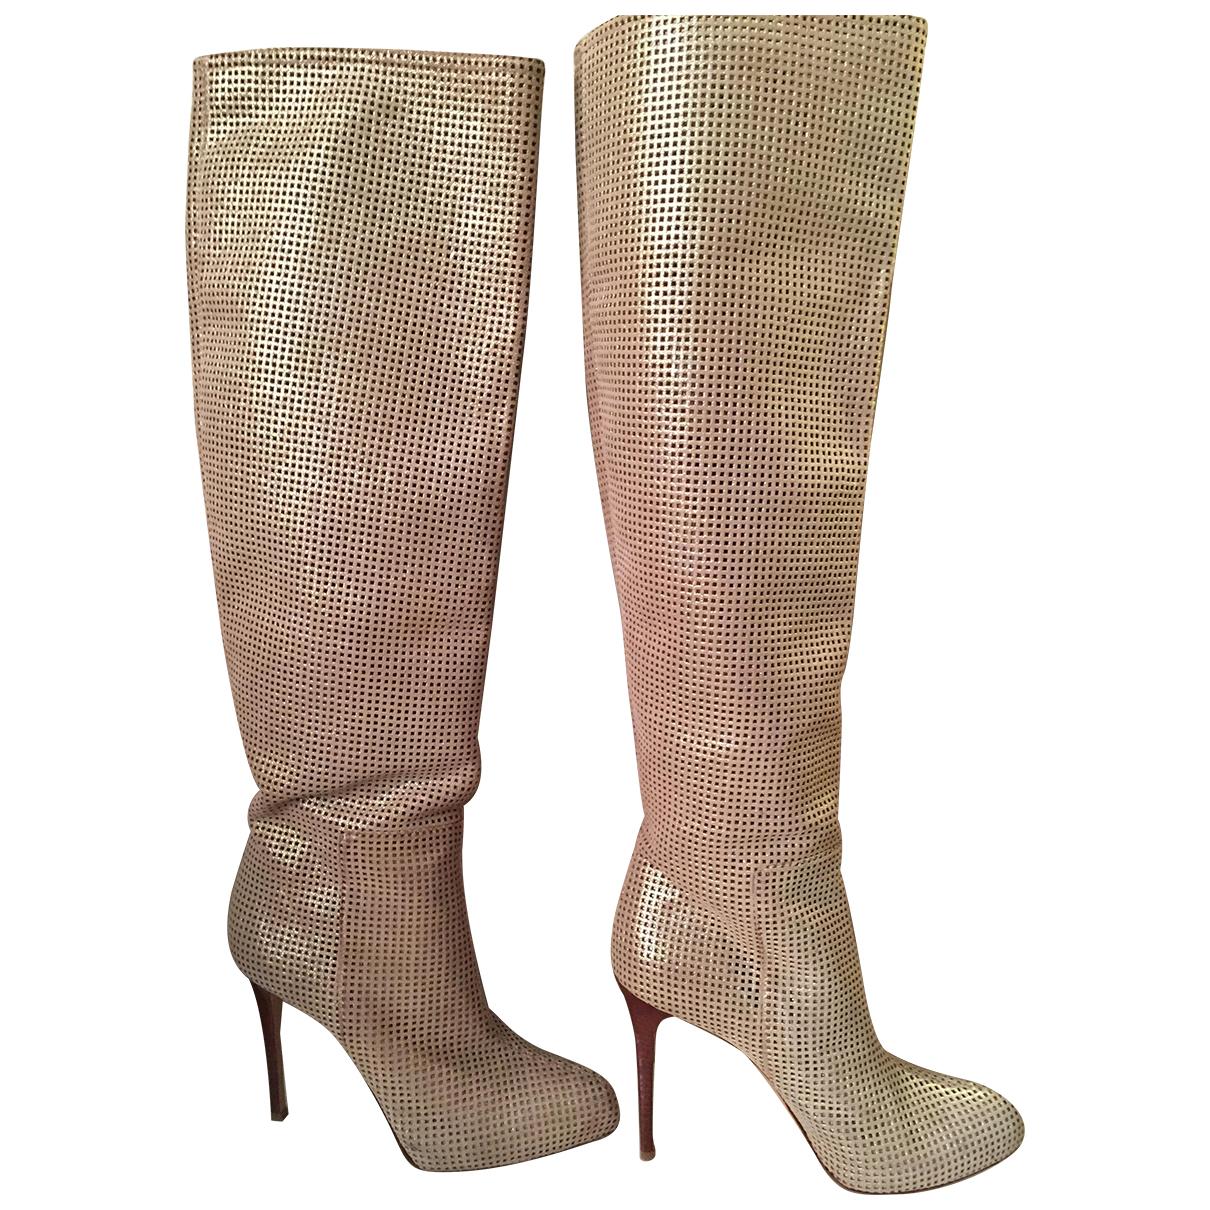 Le Silla \N Stiefel in  Gold Leder